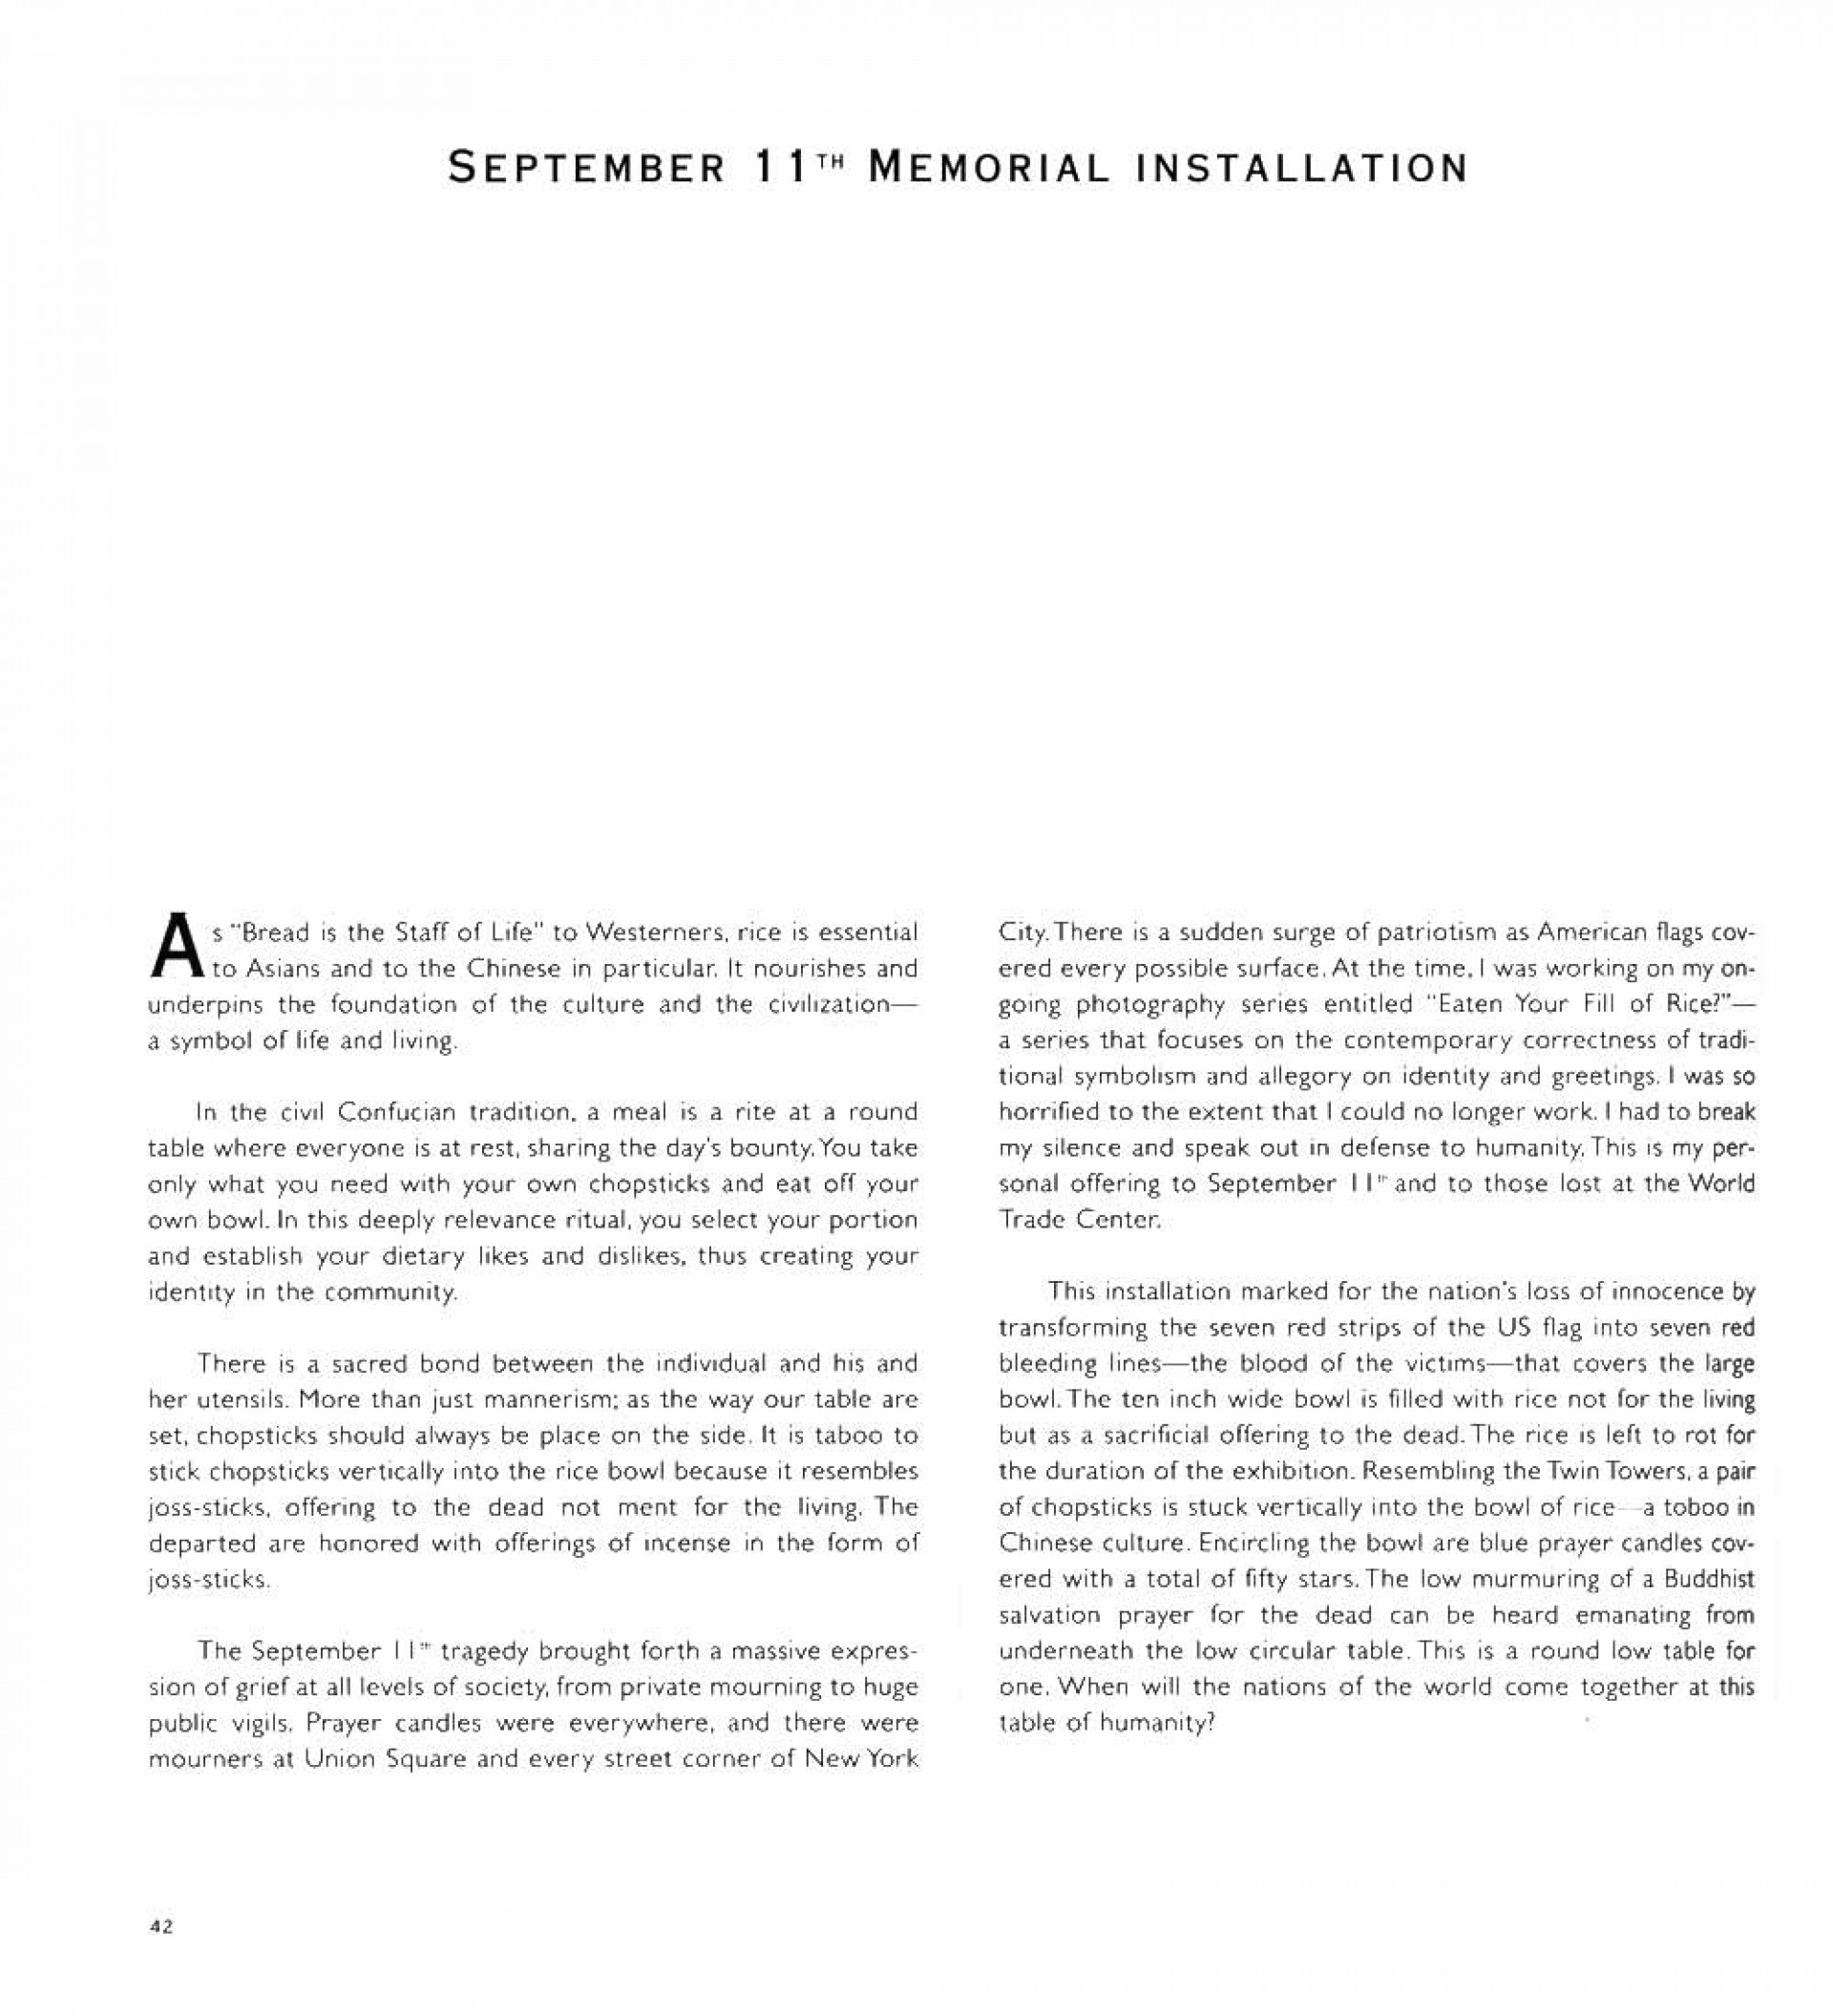 006 Essay Example For September 11th Memorial Installation  Stupendous 911 Dispatcher Fahrenheit Writing1920